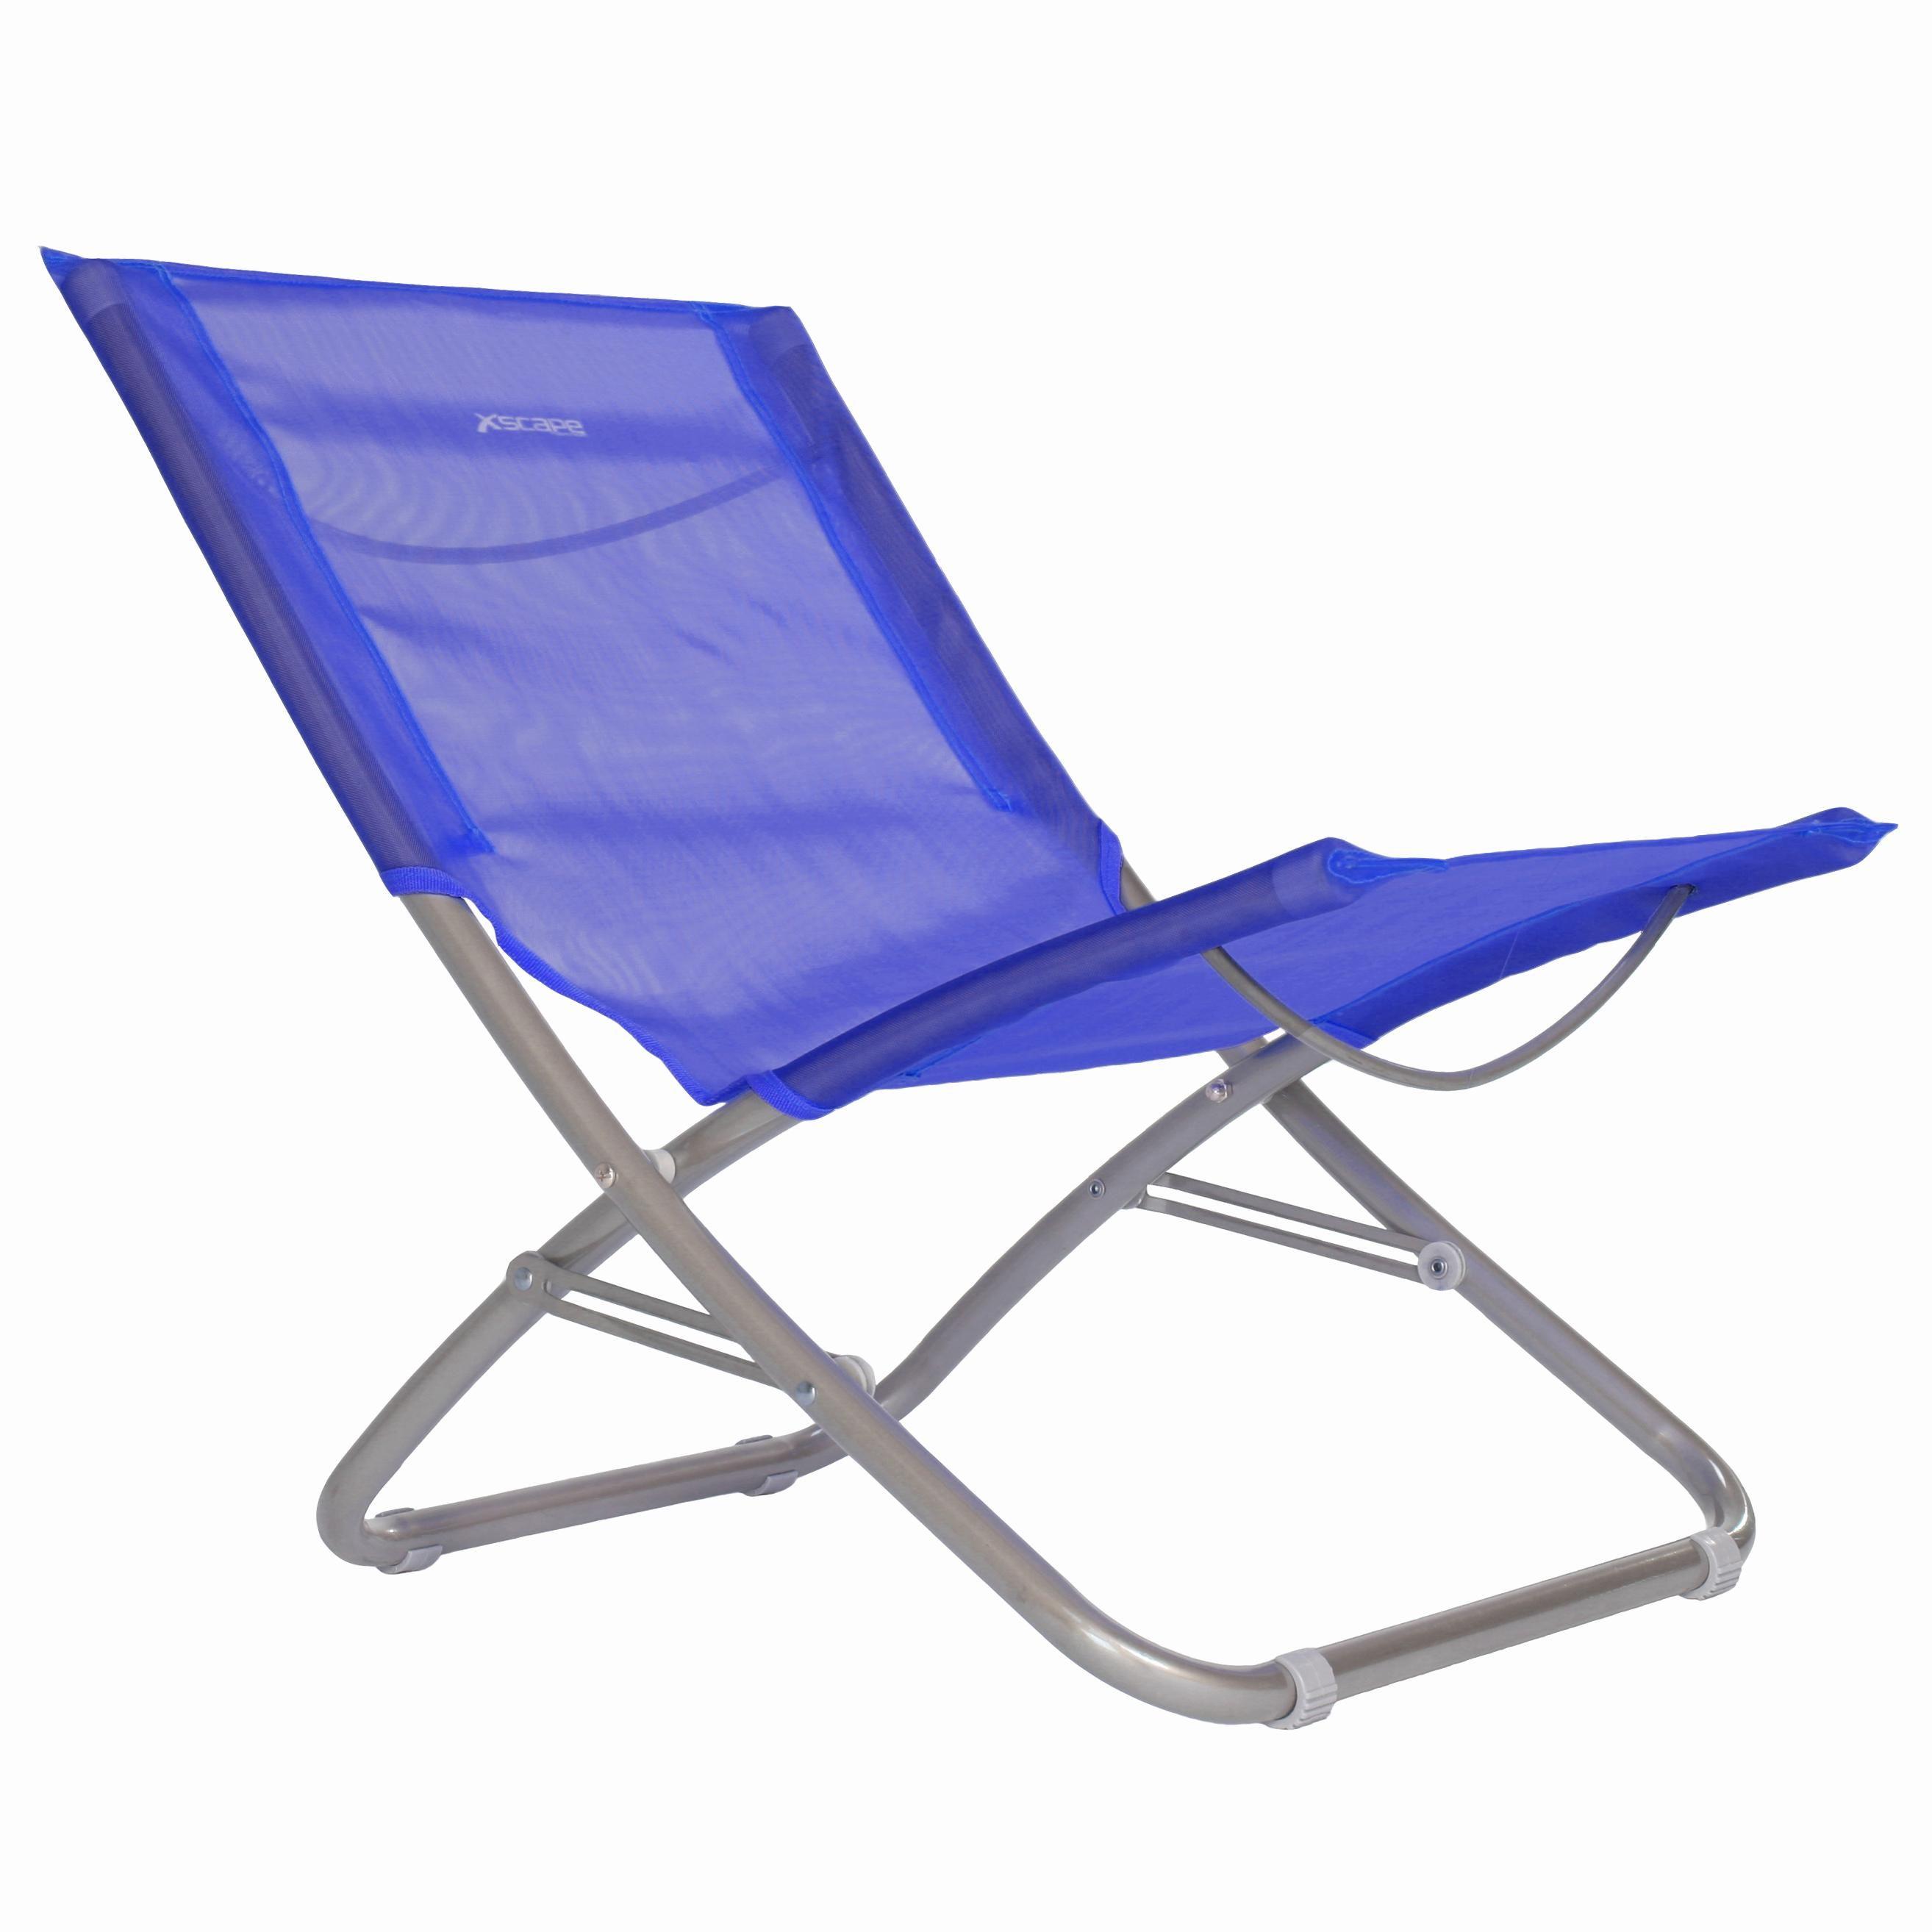 Xscape Sol Lite   Folding Beach Chair By OJ Commerce$28.99